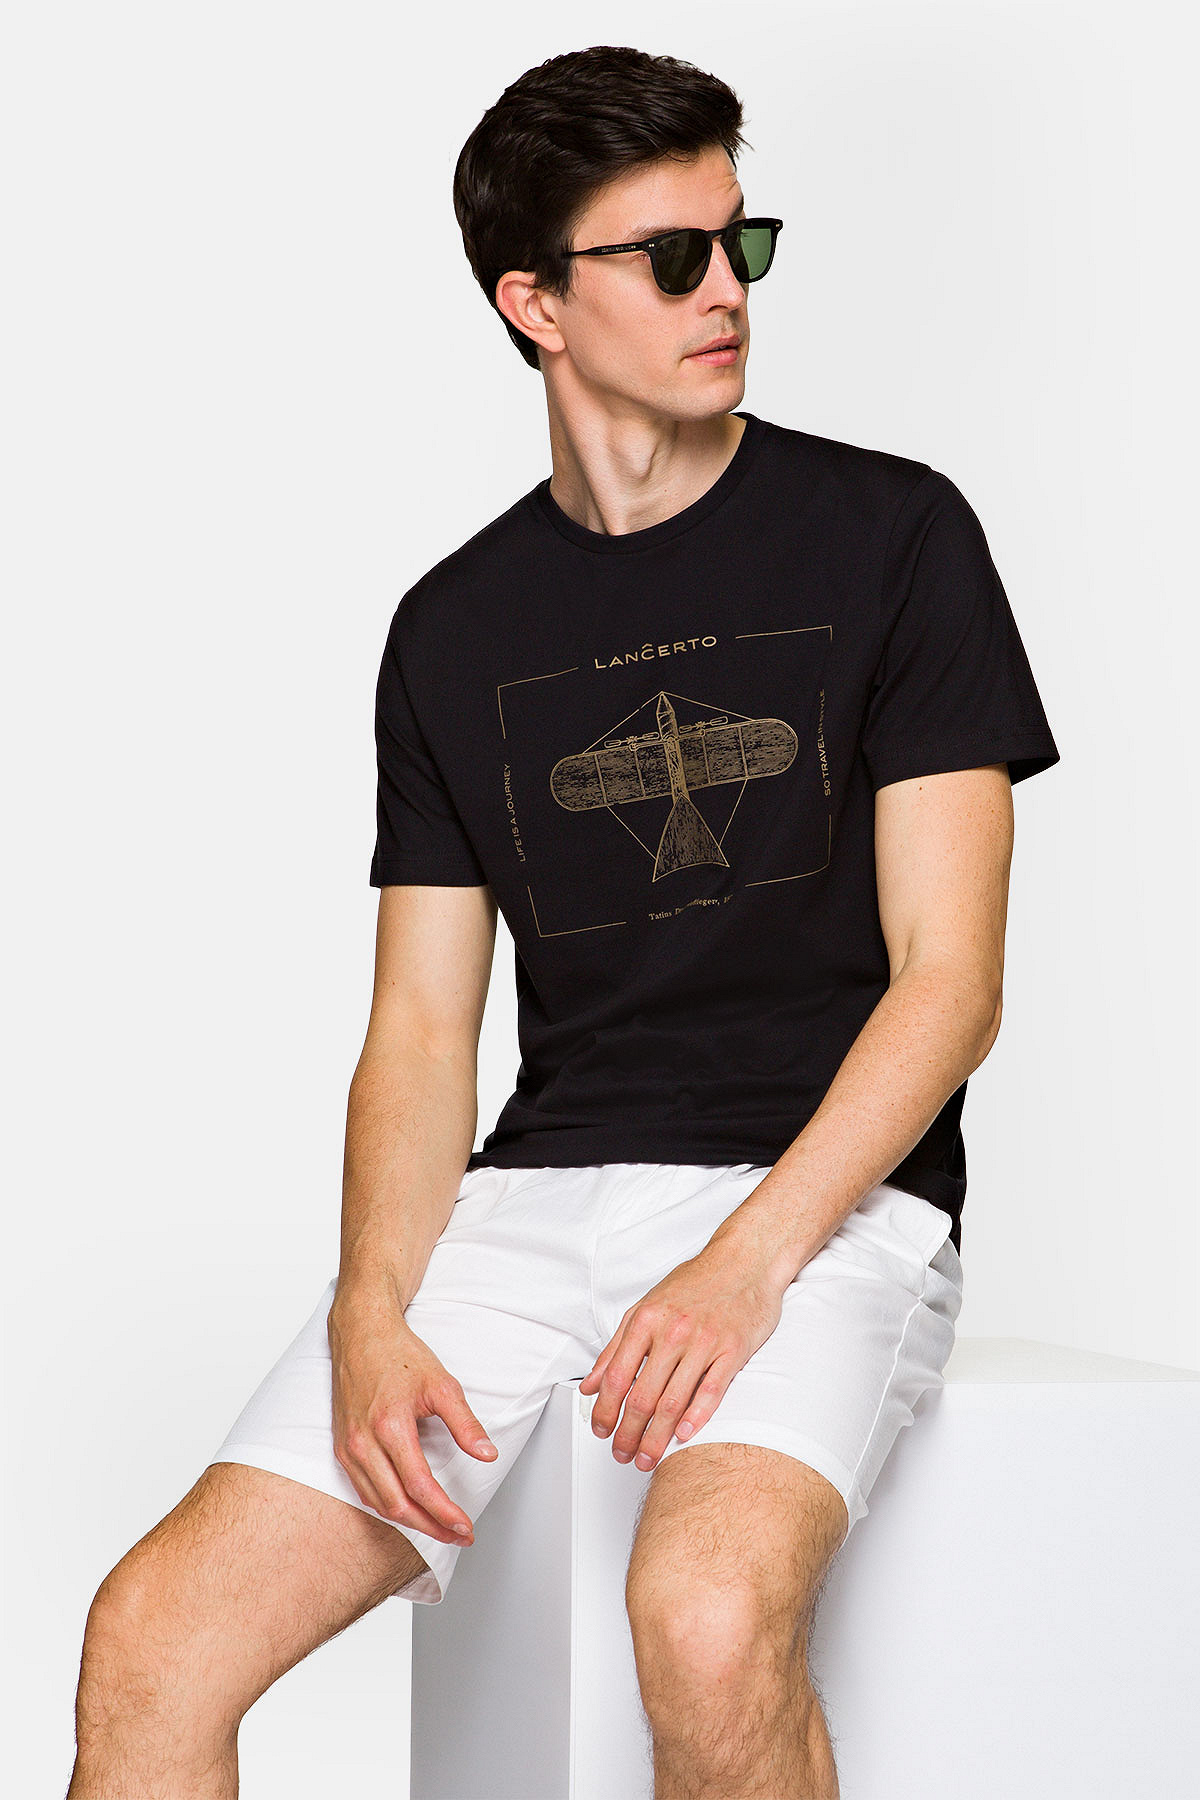 Koszulka Ciemnogranatowa Rory rozmiar 2XL; 3XL; 4XL; 5XL; L; M; XL